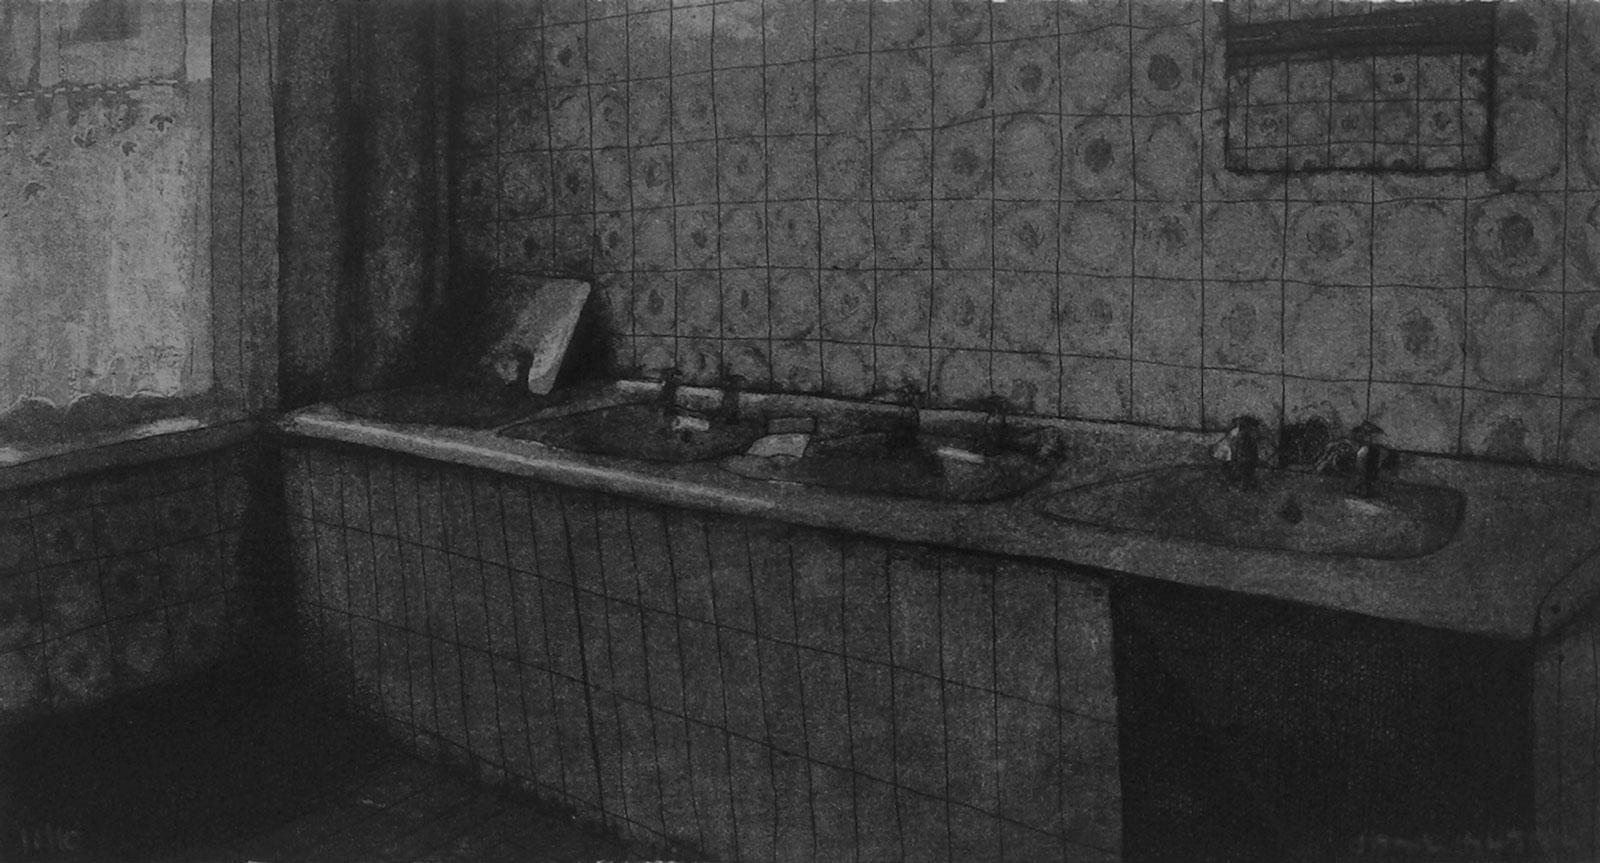 Jane Glynn, Sinks